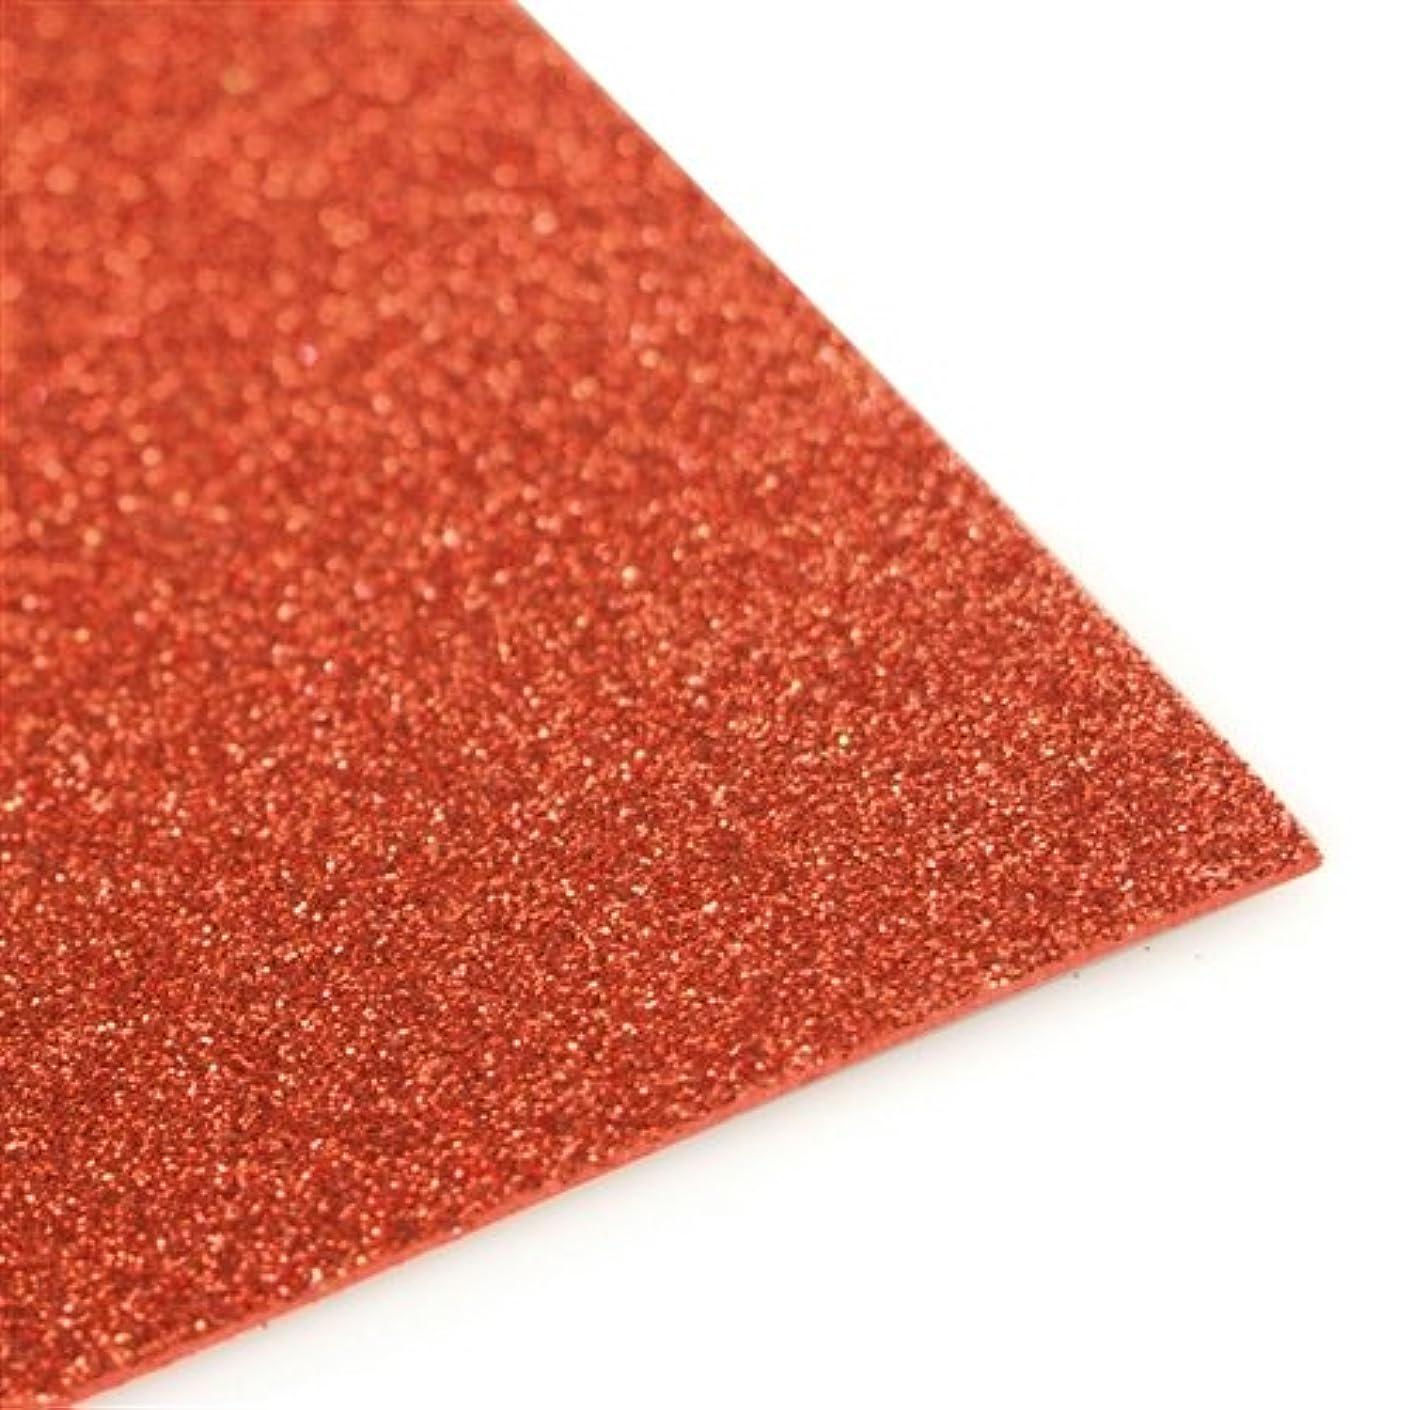 Homeford Firefly Imports Glitter EVA Foam Sheet, 13 x 18-Inch, 10-Pack, Red